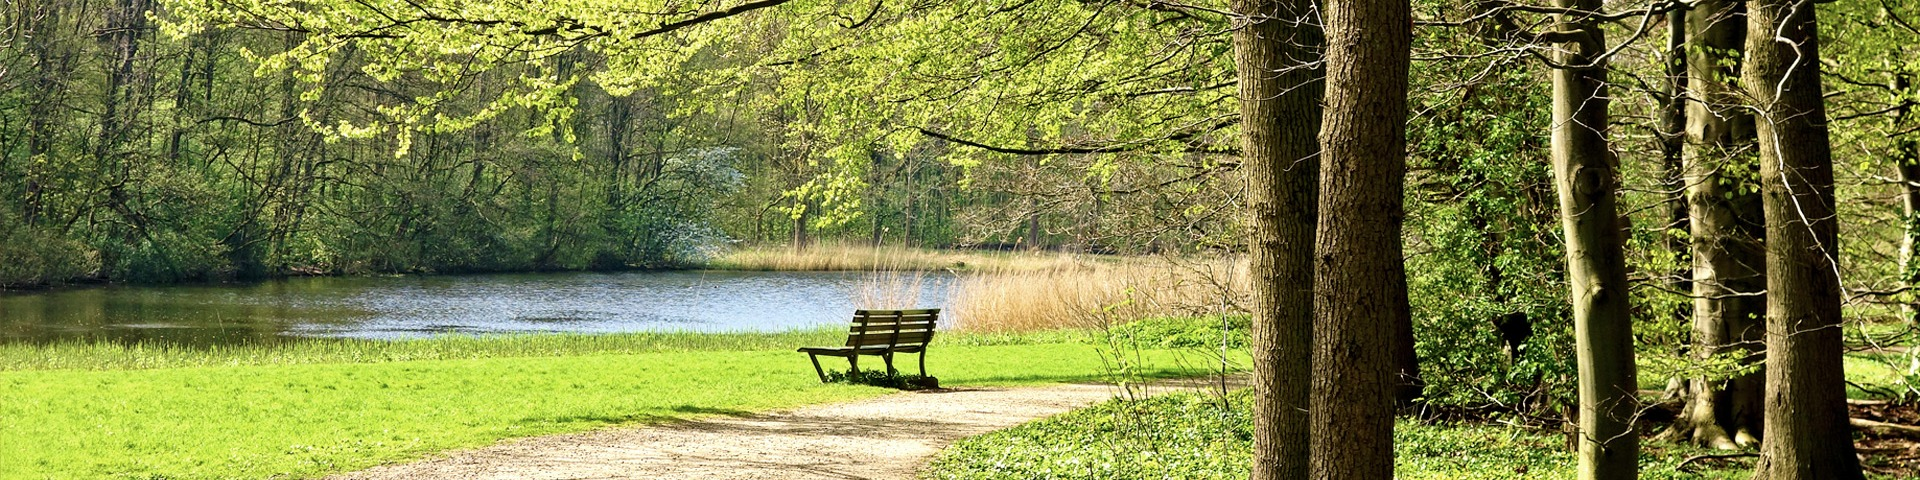 peaceful park along the river in Nieuwegein